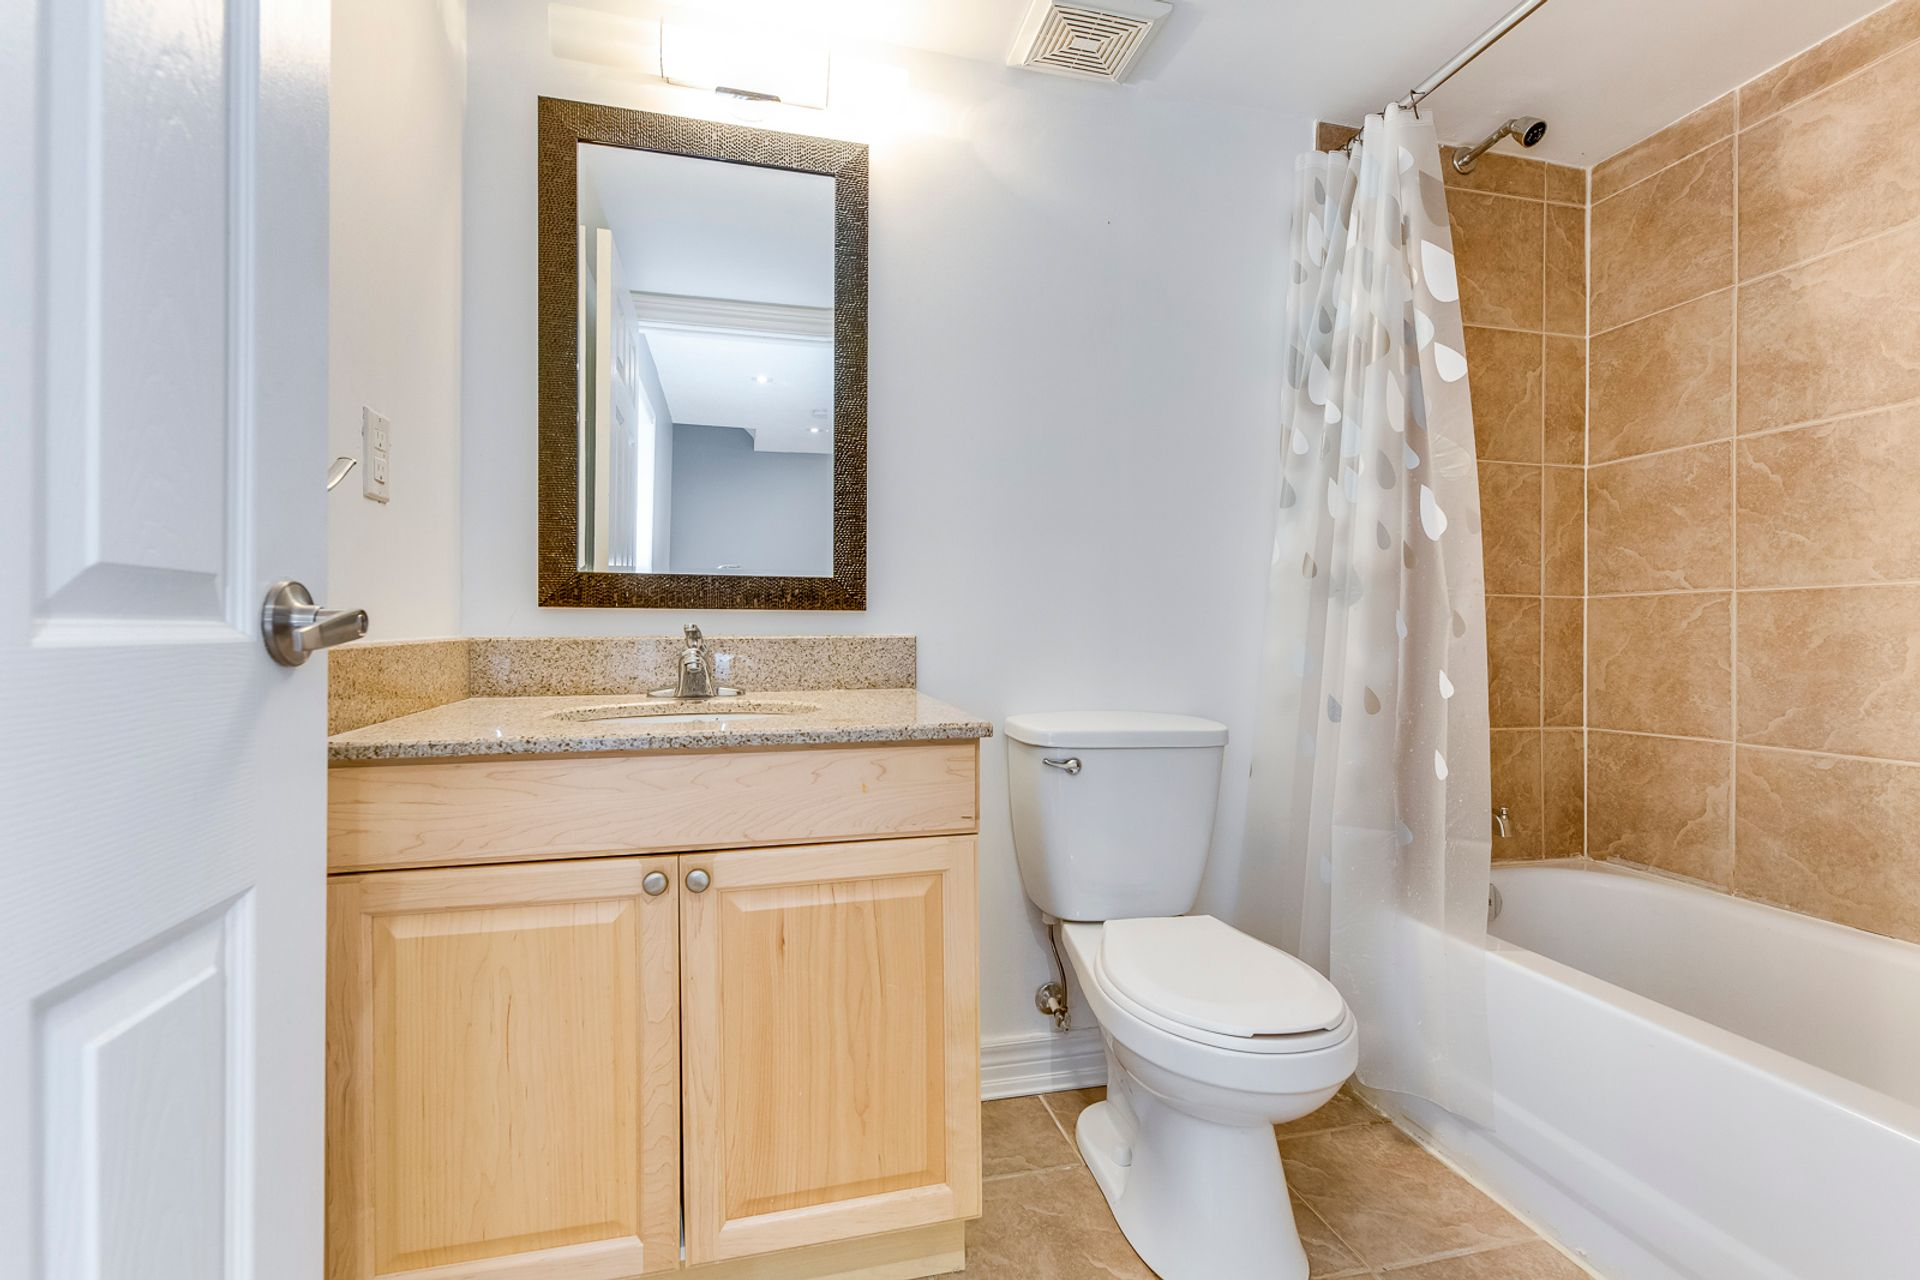 Basement Bathroom - 3720 Nightstar Dr, Mississauga - Elite3 & Team at 3720 Nightstar Drive, Churchill Meadows, Mississauga